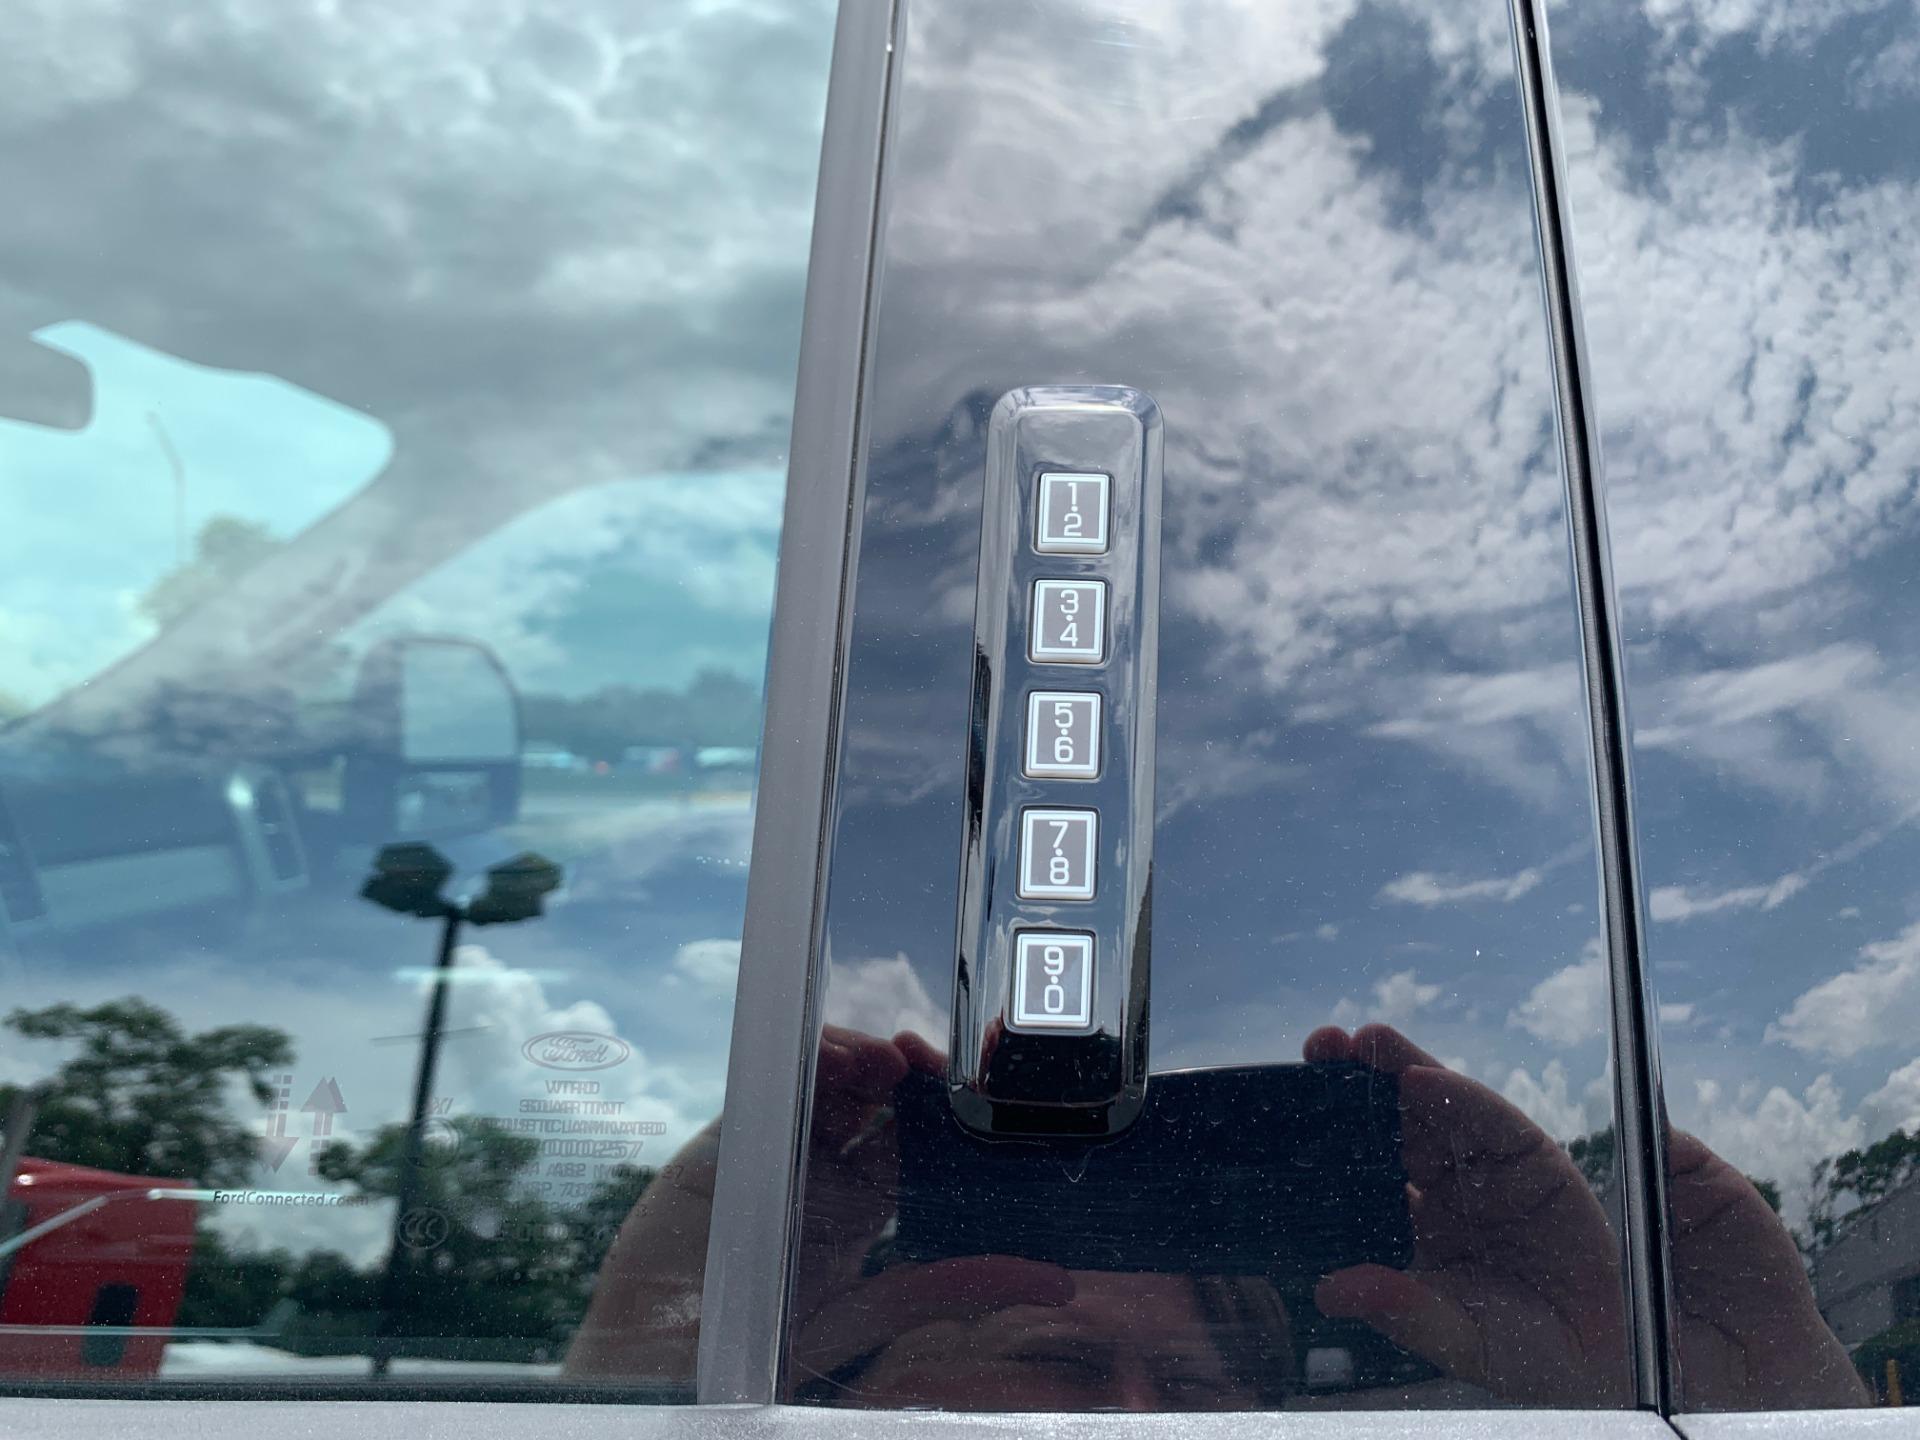 Used-2019-Ford-F350-Super-Duty-Lariat-Pickup-Ultimate-Mega-Raptor-BUILD-4x4